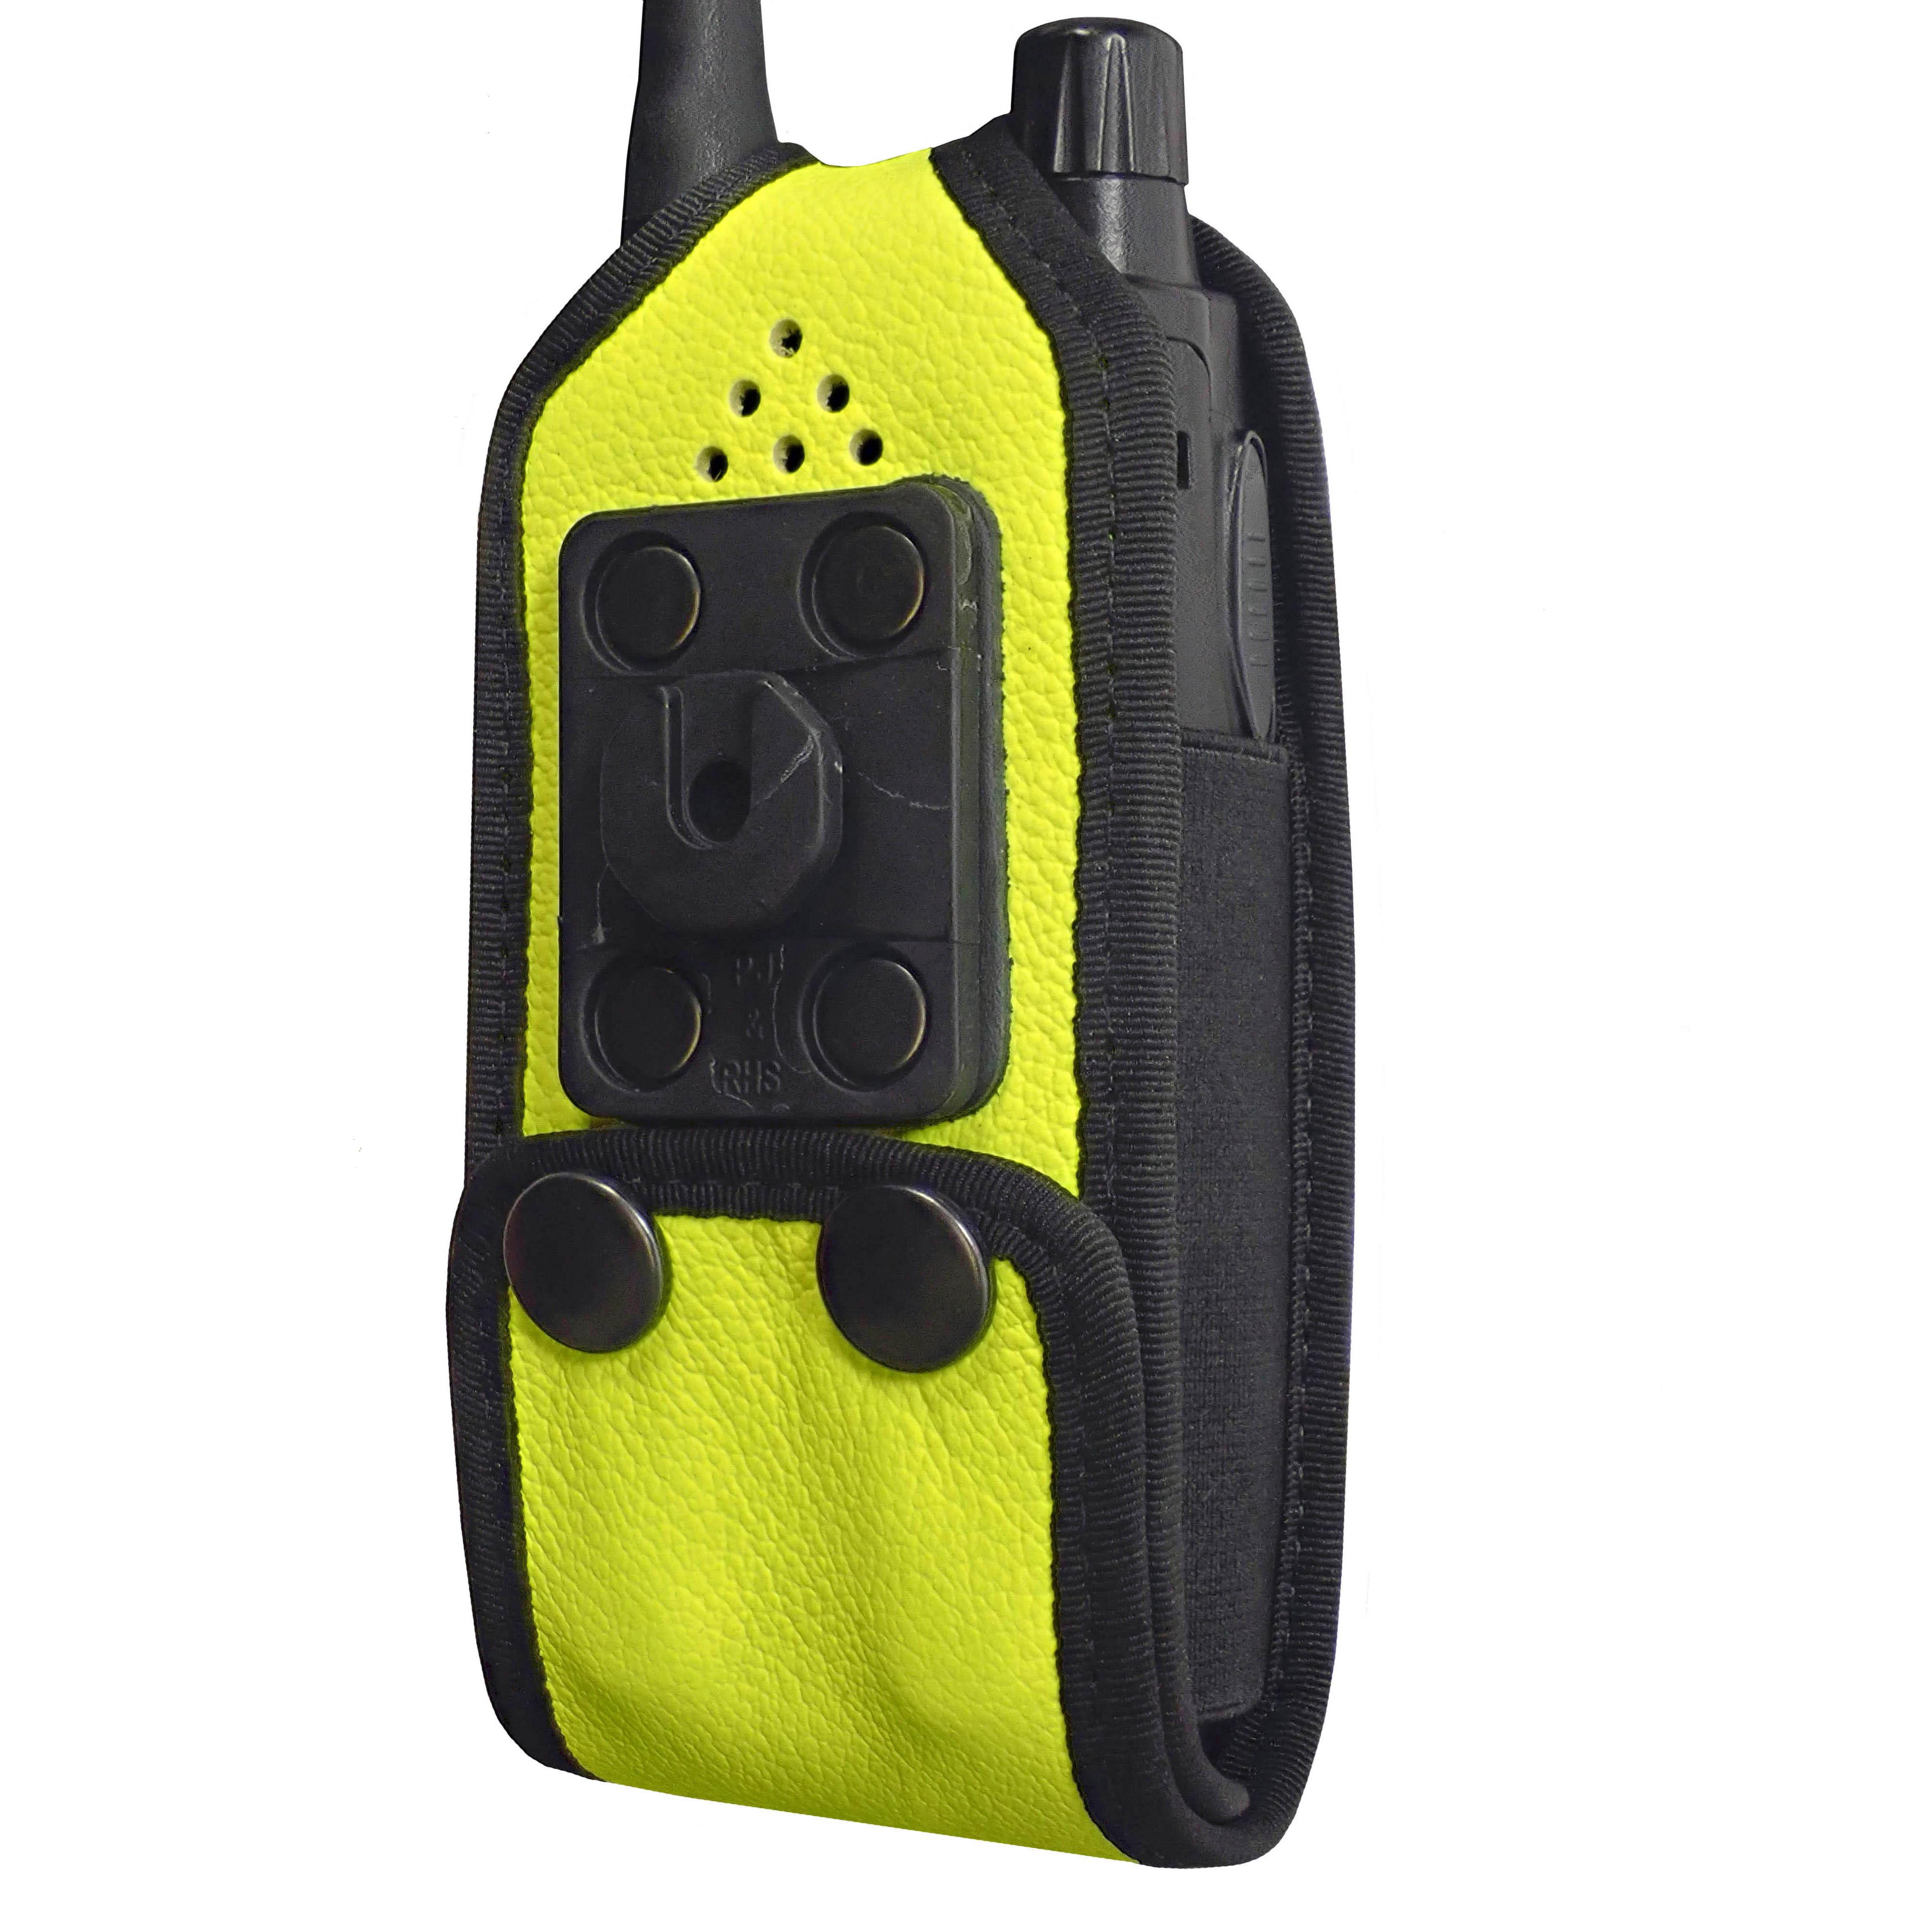 Sepura SRP2000 Tetra Hi-Vis Yellow leather radio case with Click-On